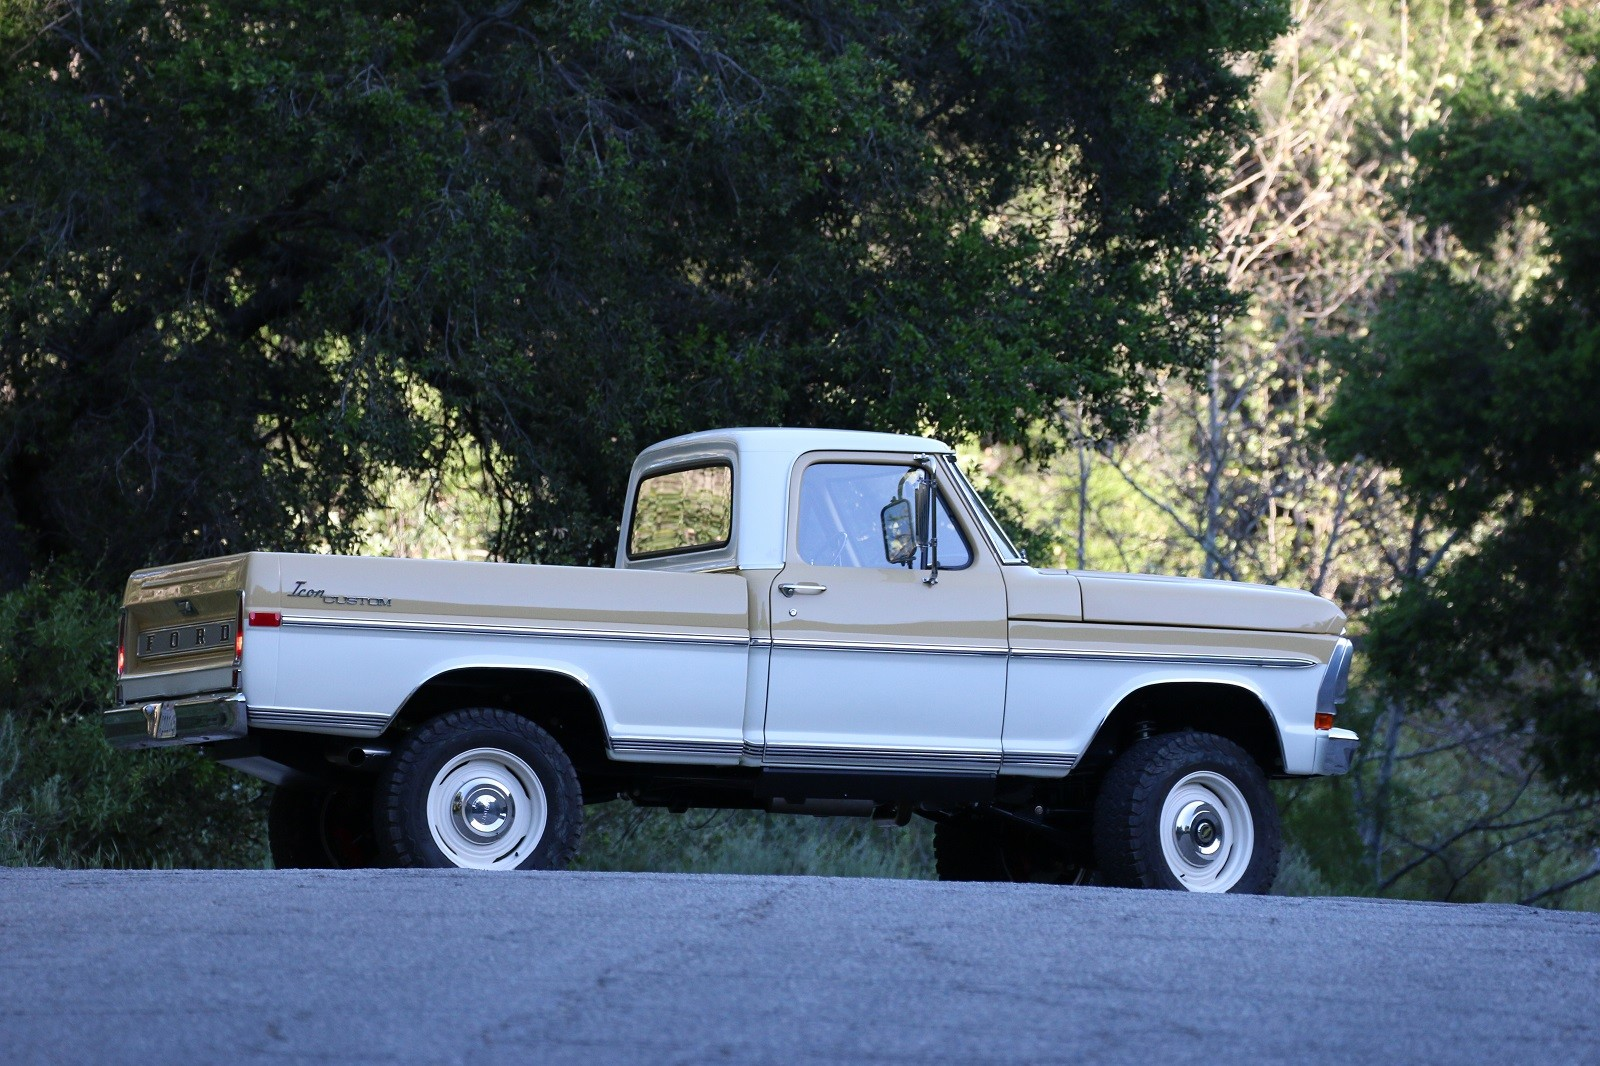 Foto de ICON 4x4 Ranger 1970 Reformer Series (5/38)